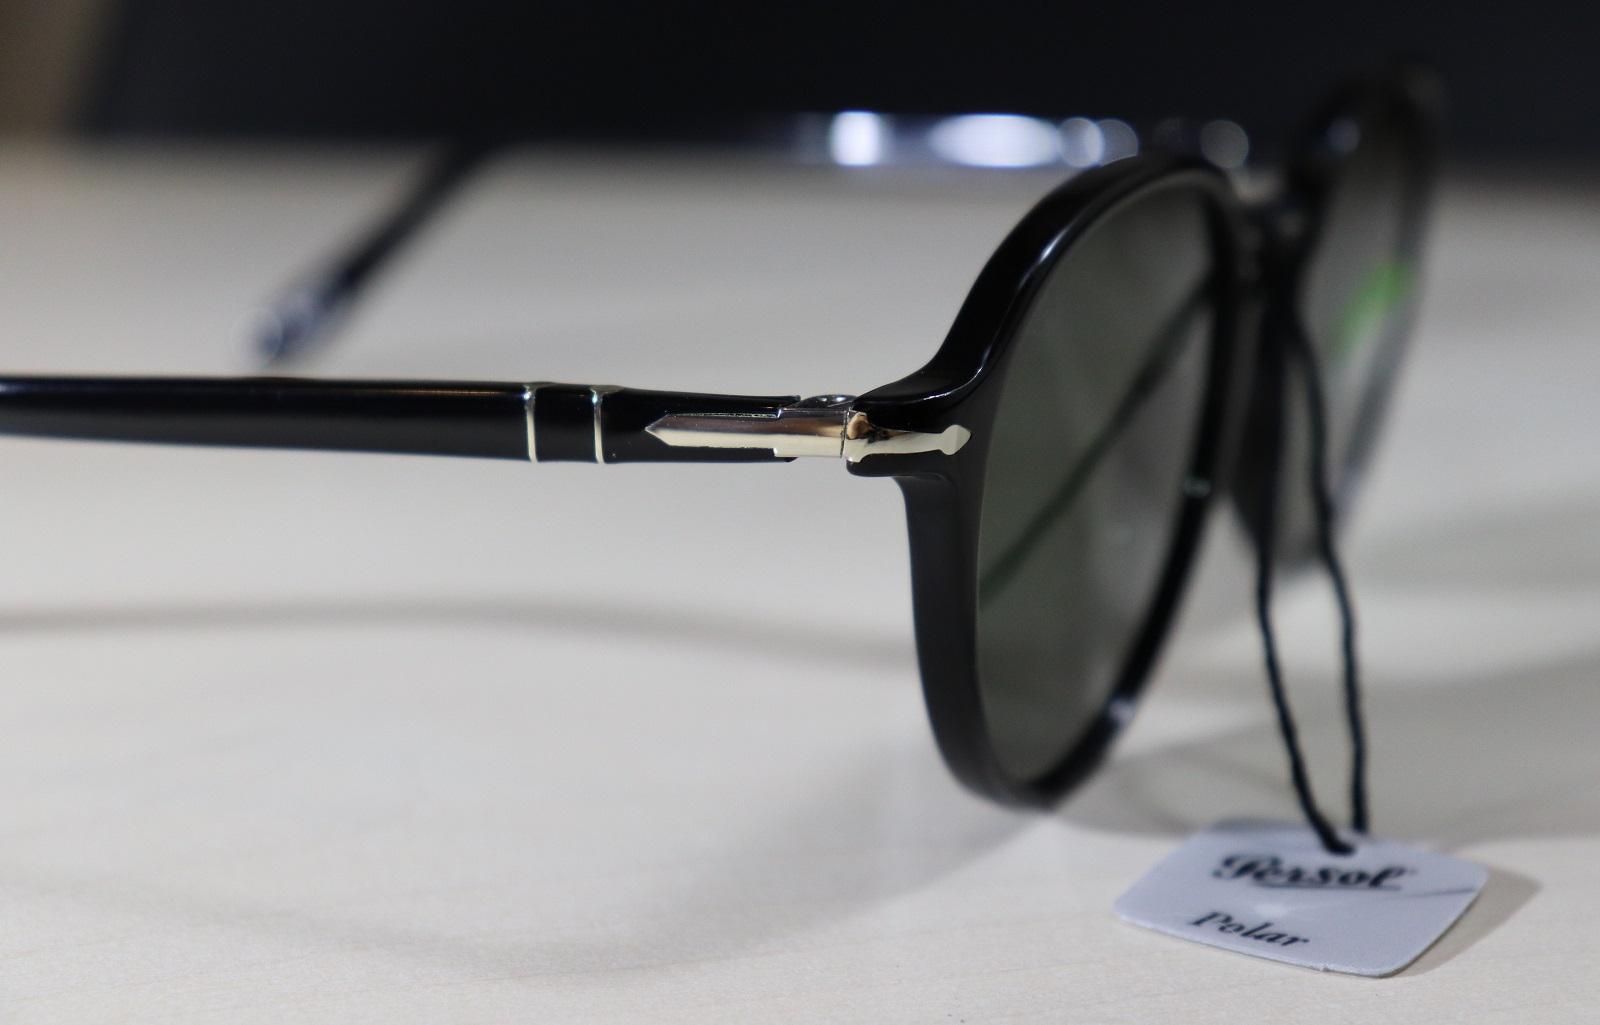 Spot fake Persol sunglasses - check the metal arrow